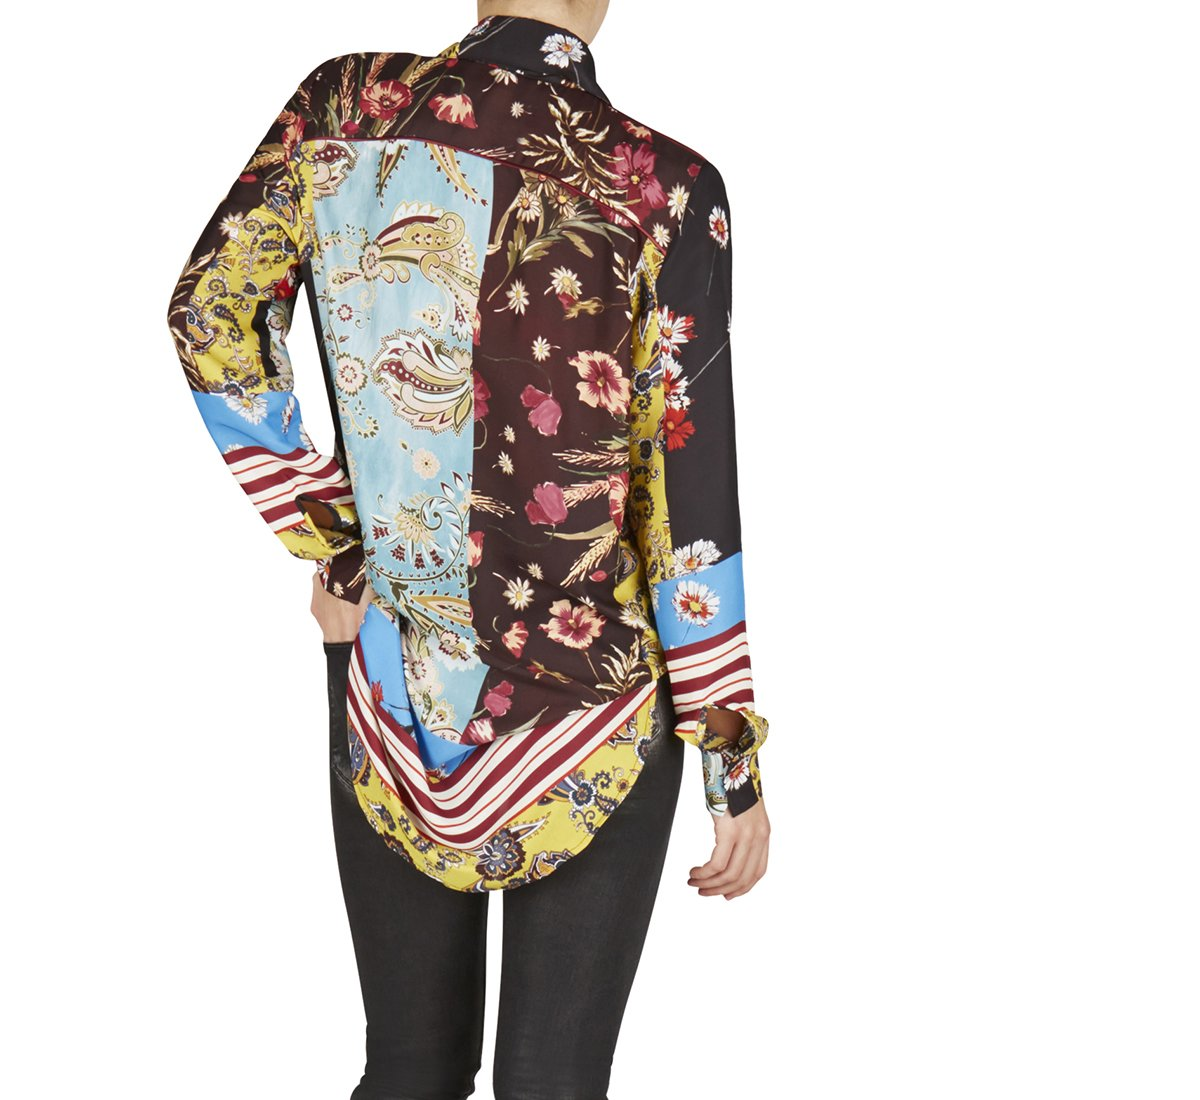 Camicia in tessuto fantasia floreale